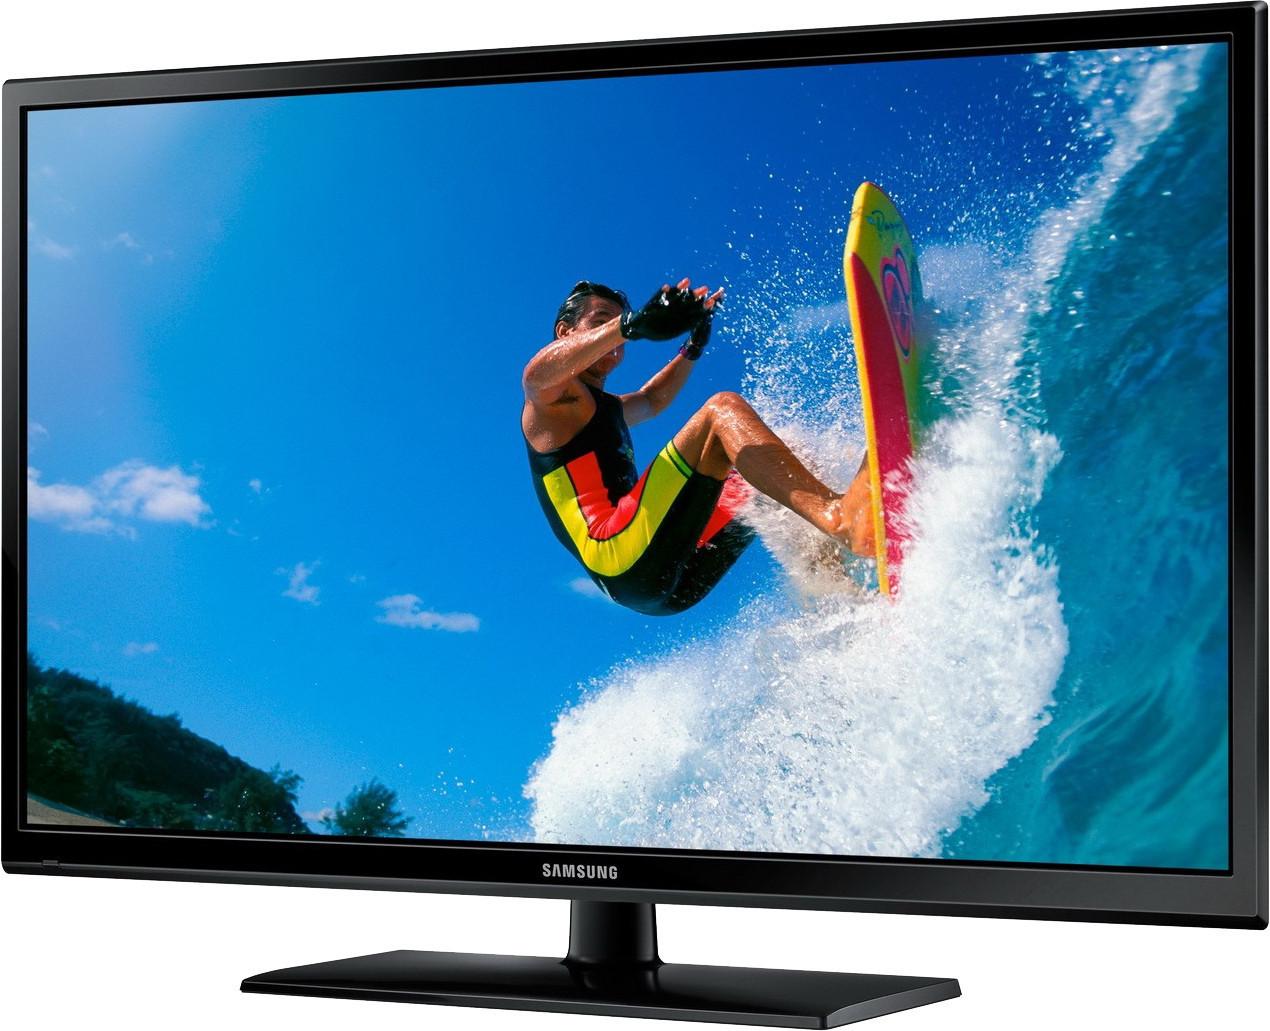 Телевизор Samsung UE50H5000 (100Гц, Full HD)